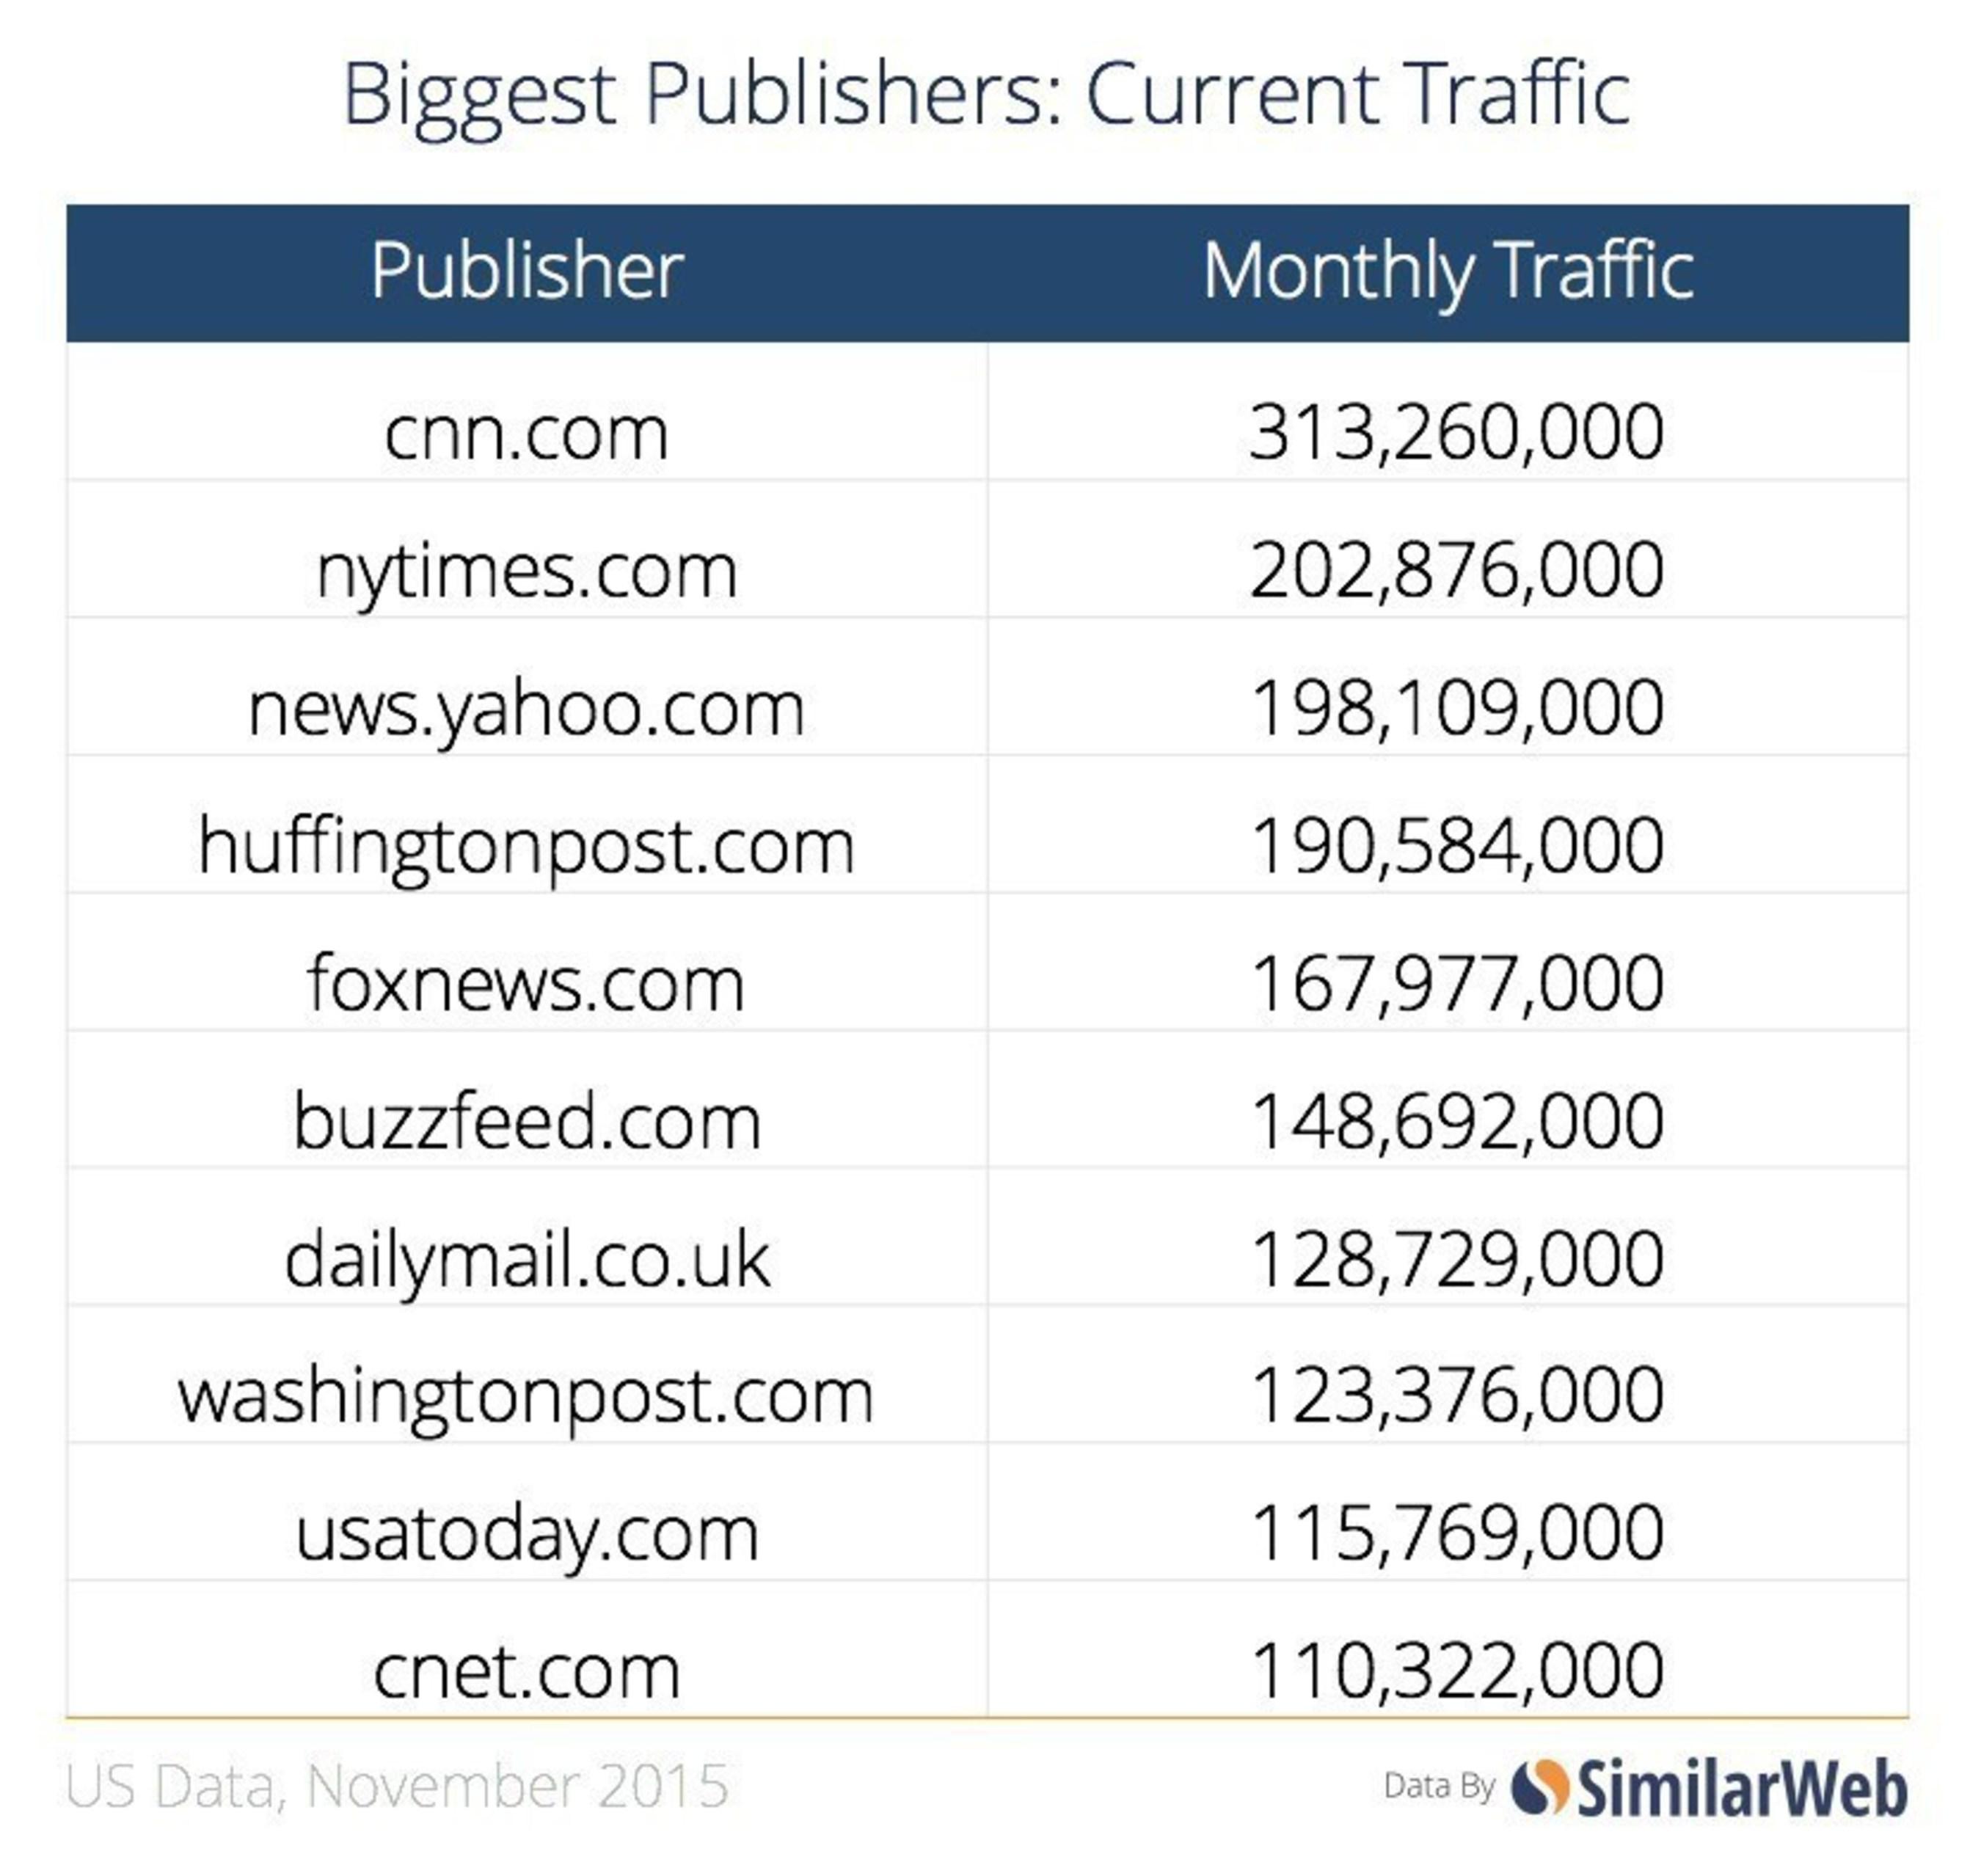 Biggest Publishers: Current Traffic